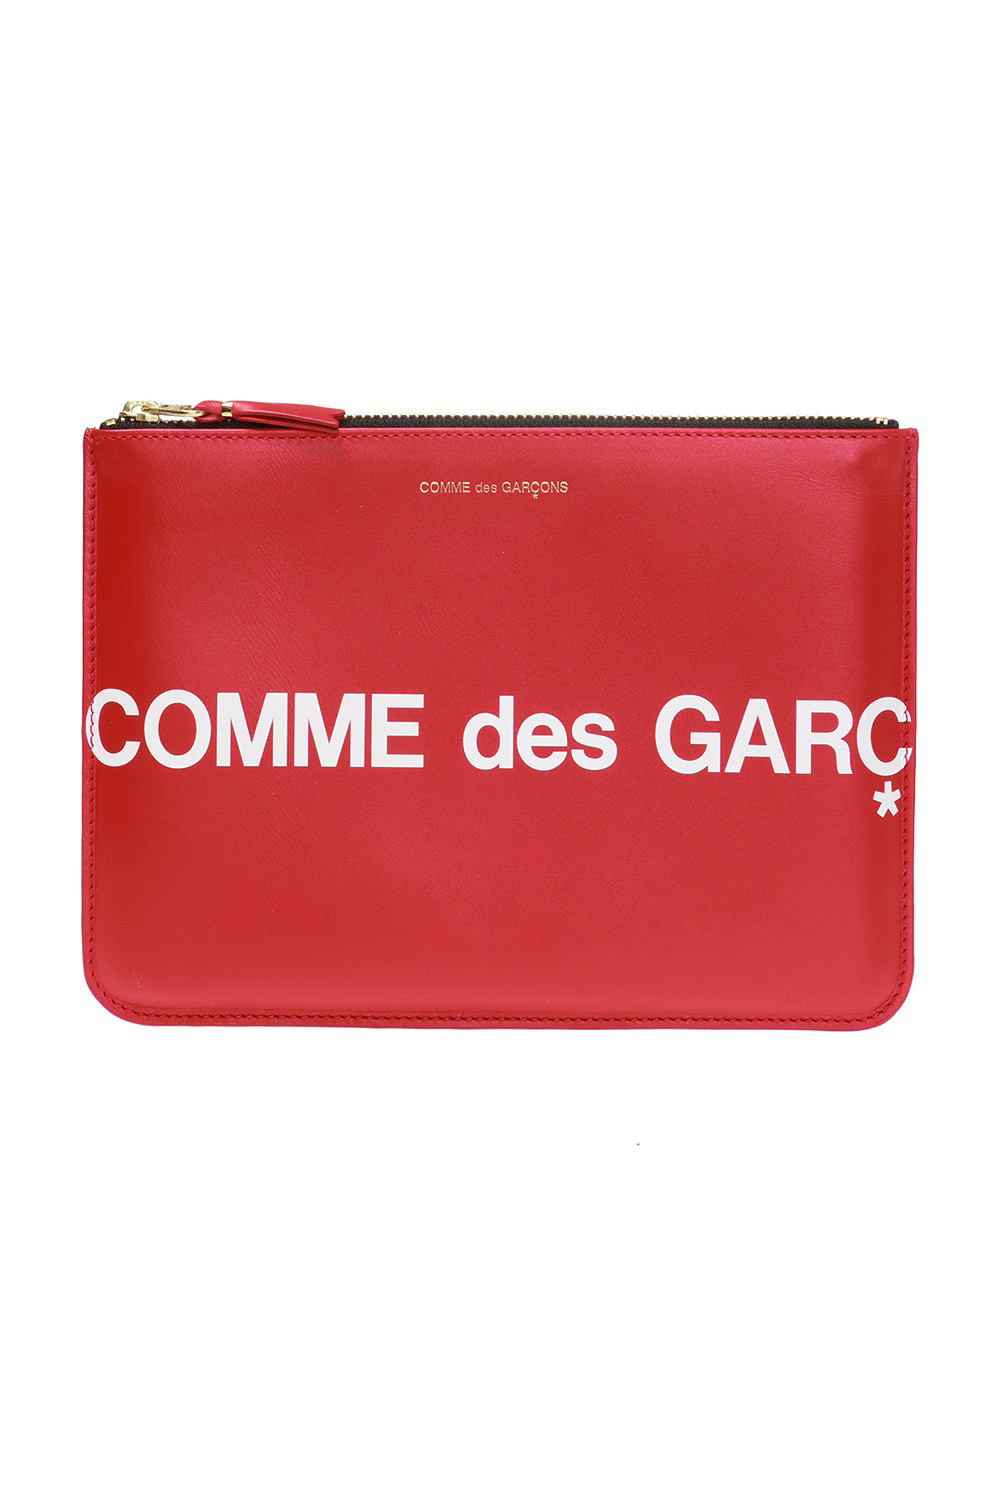 Comme des Garcons Logo-printed pouch